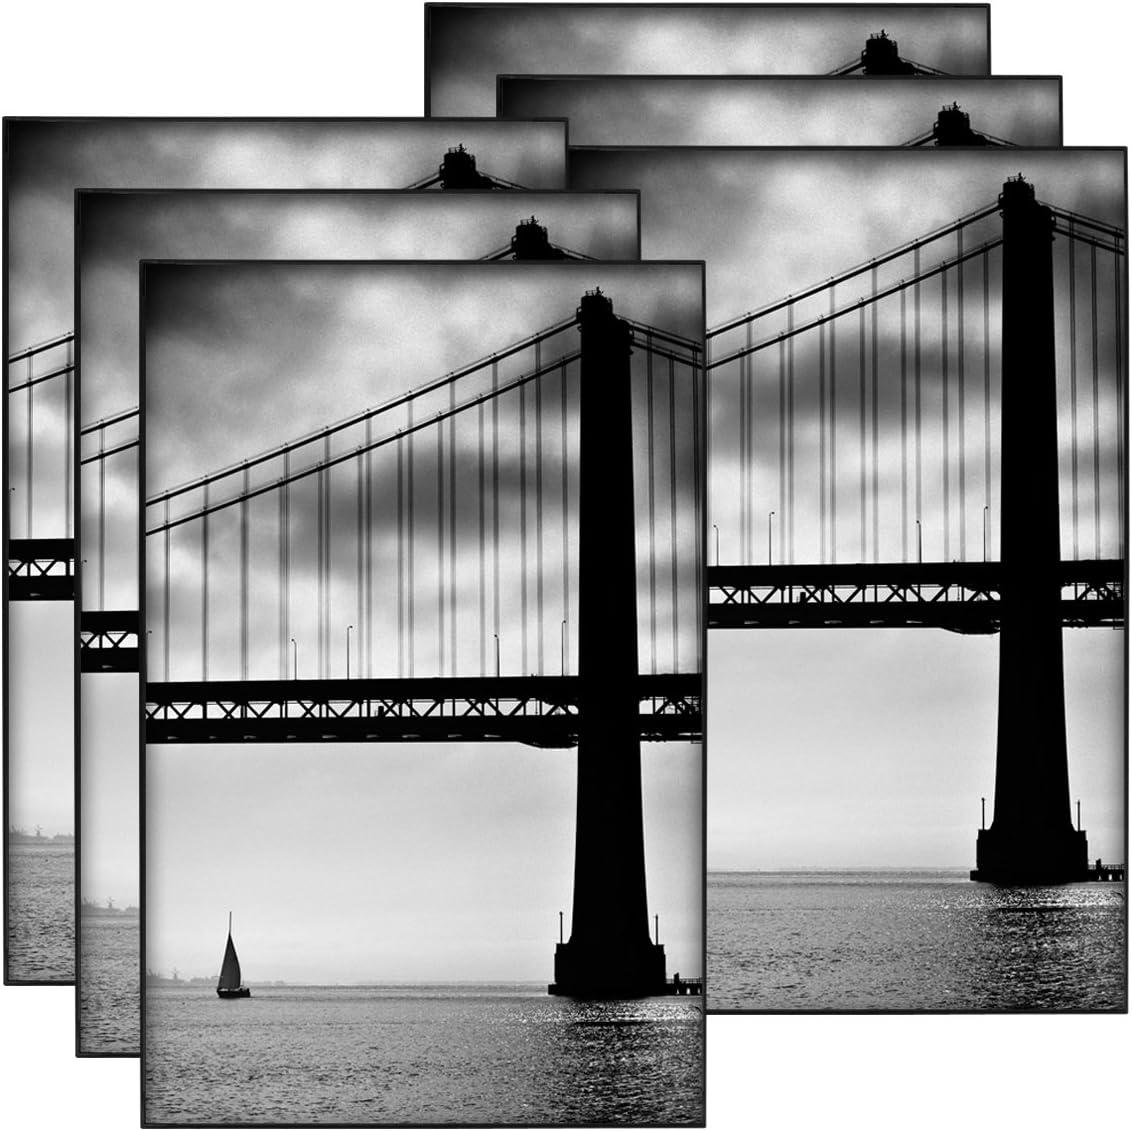 Black 11 by 17-Inch MCS 65637 Format Frame 6-Pack